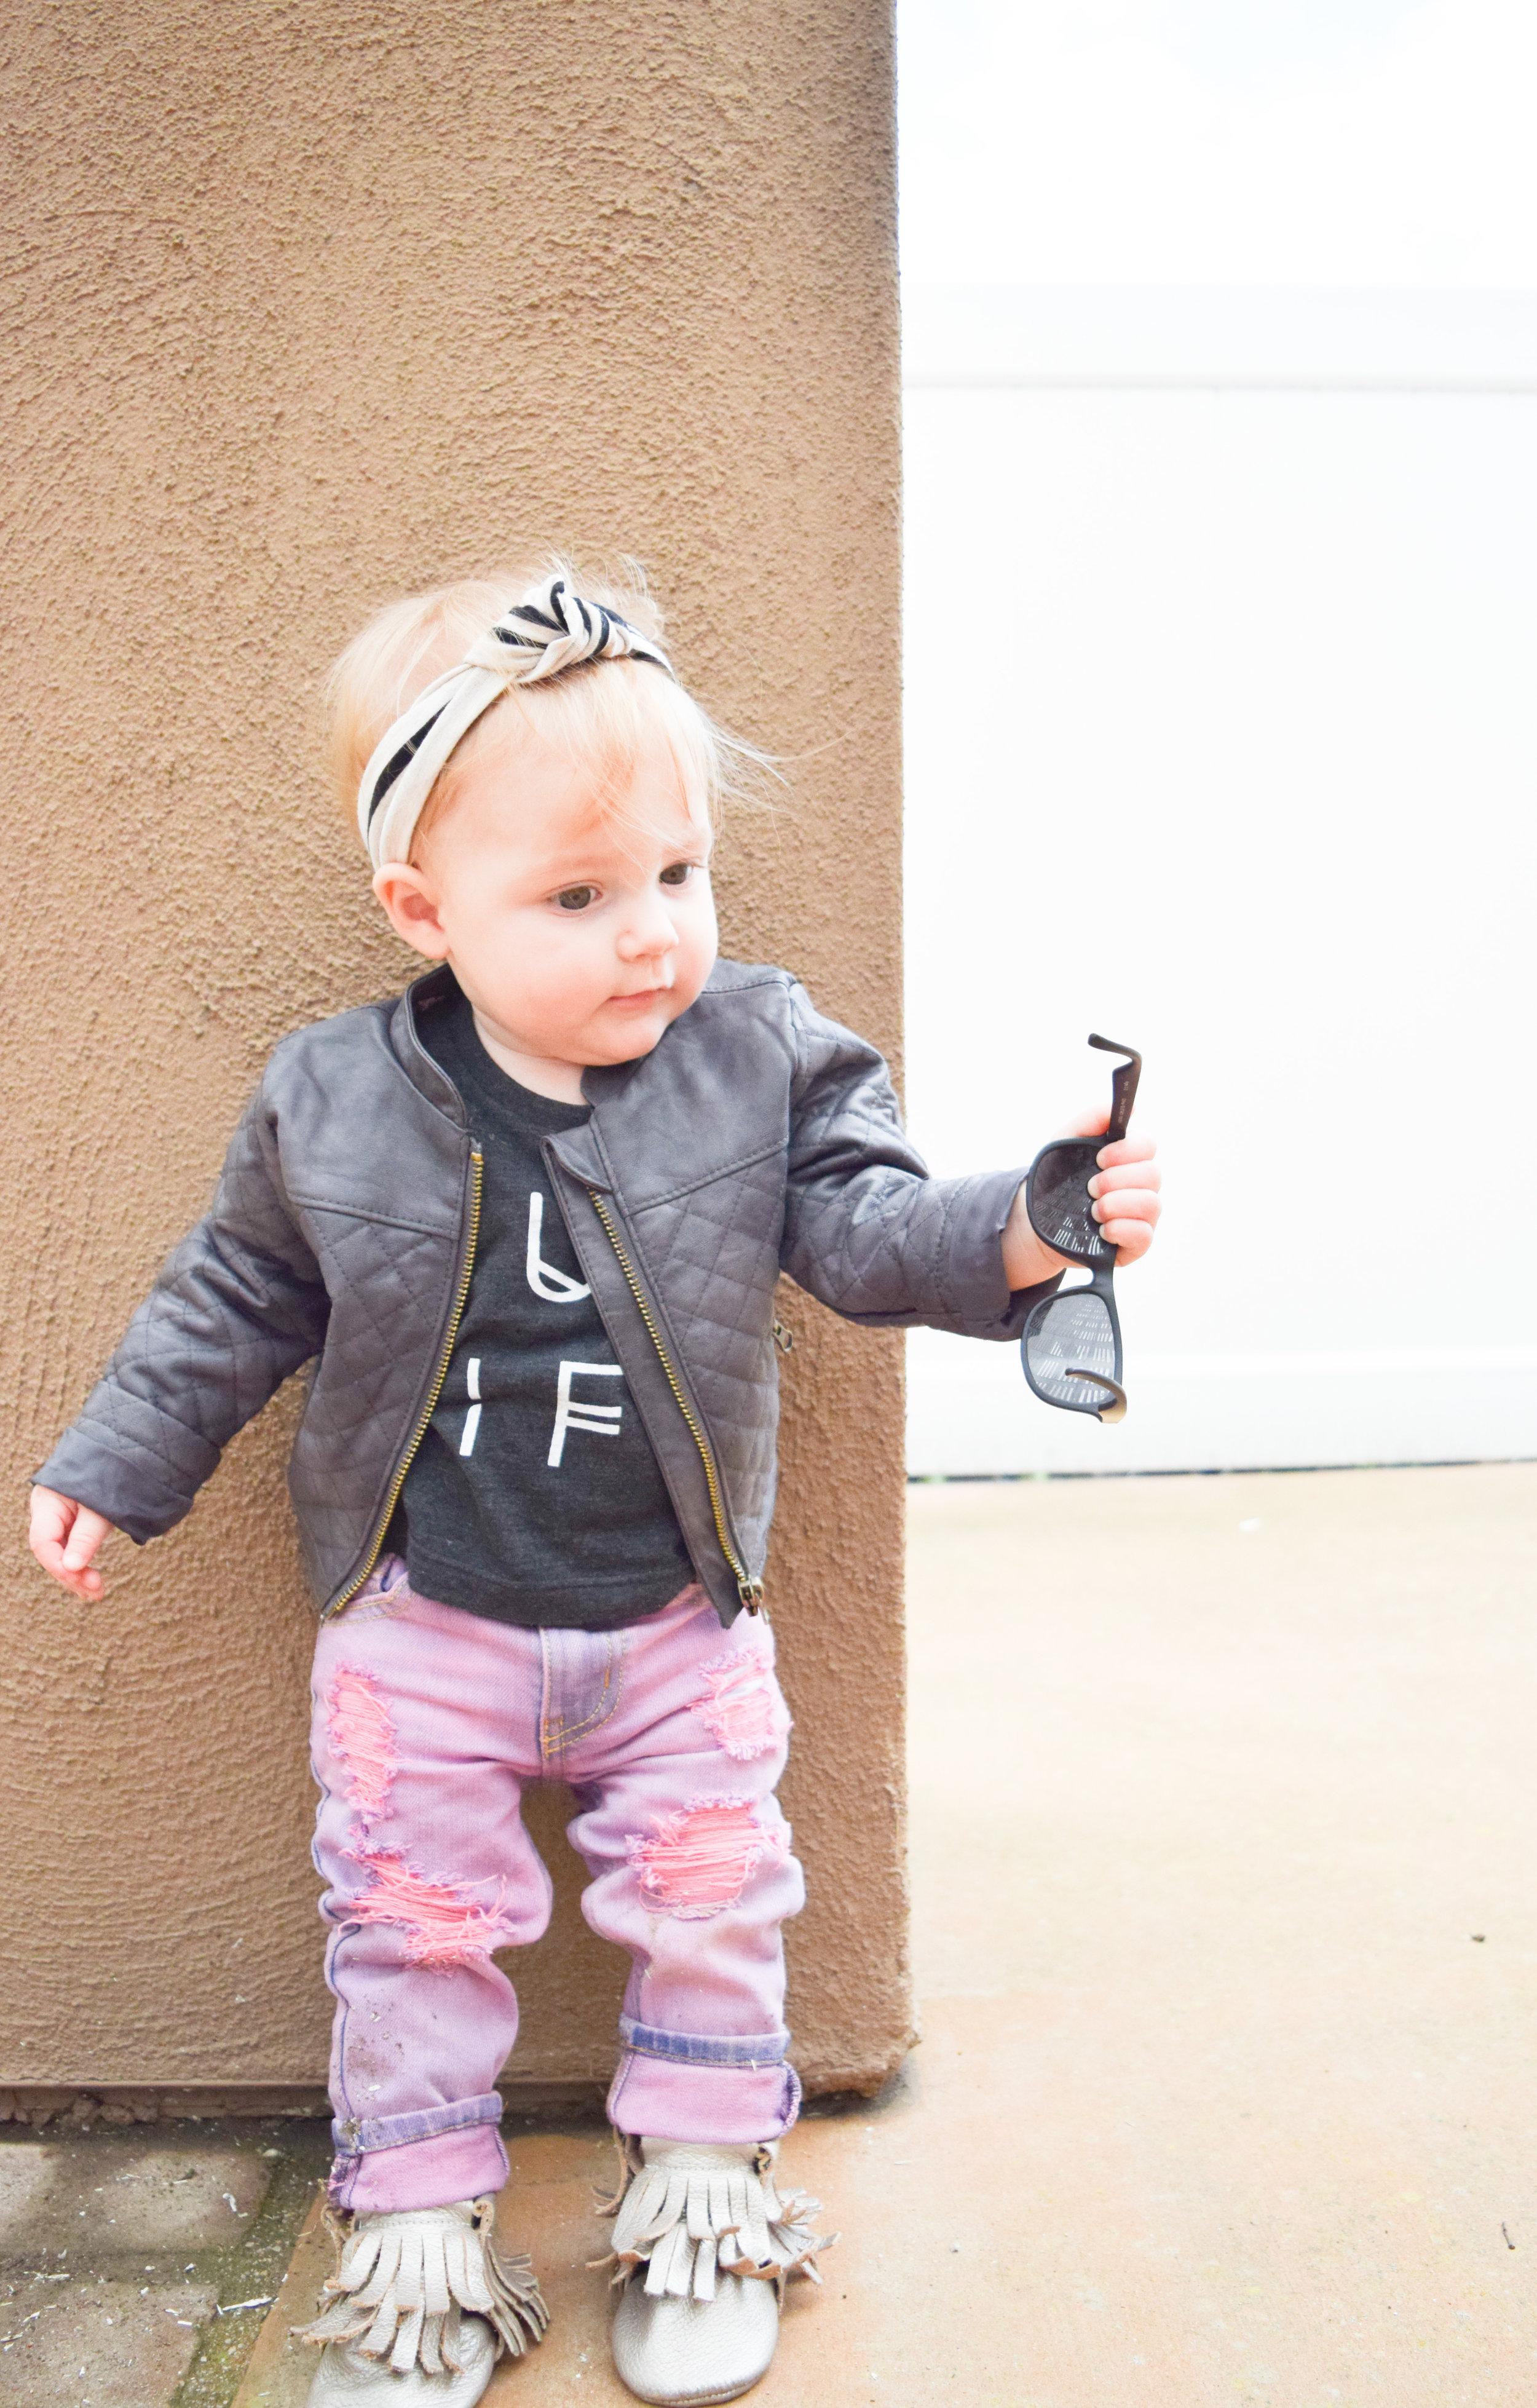 e7a3b31430cfa BABY FASHION | Rocker Baby in Distressed Denim + Leather — The ...